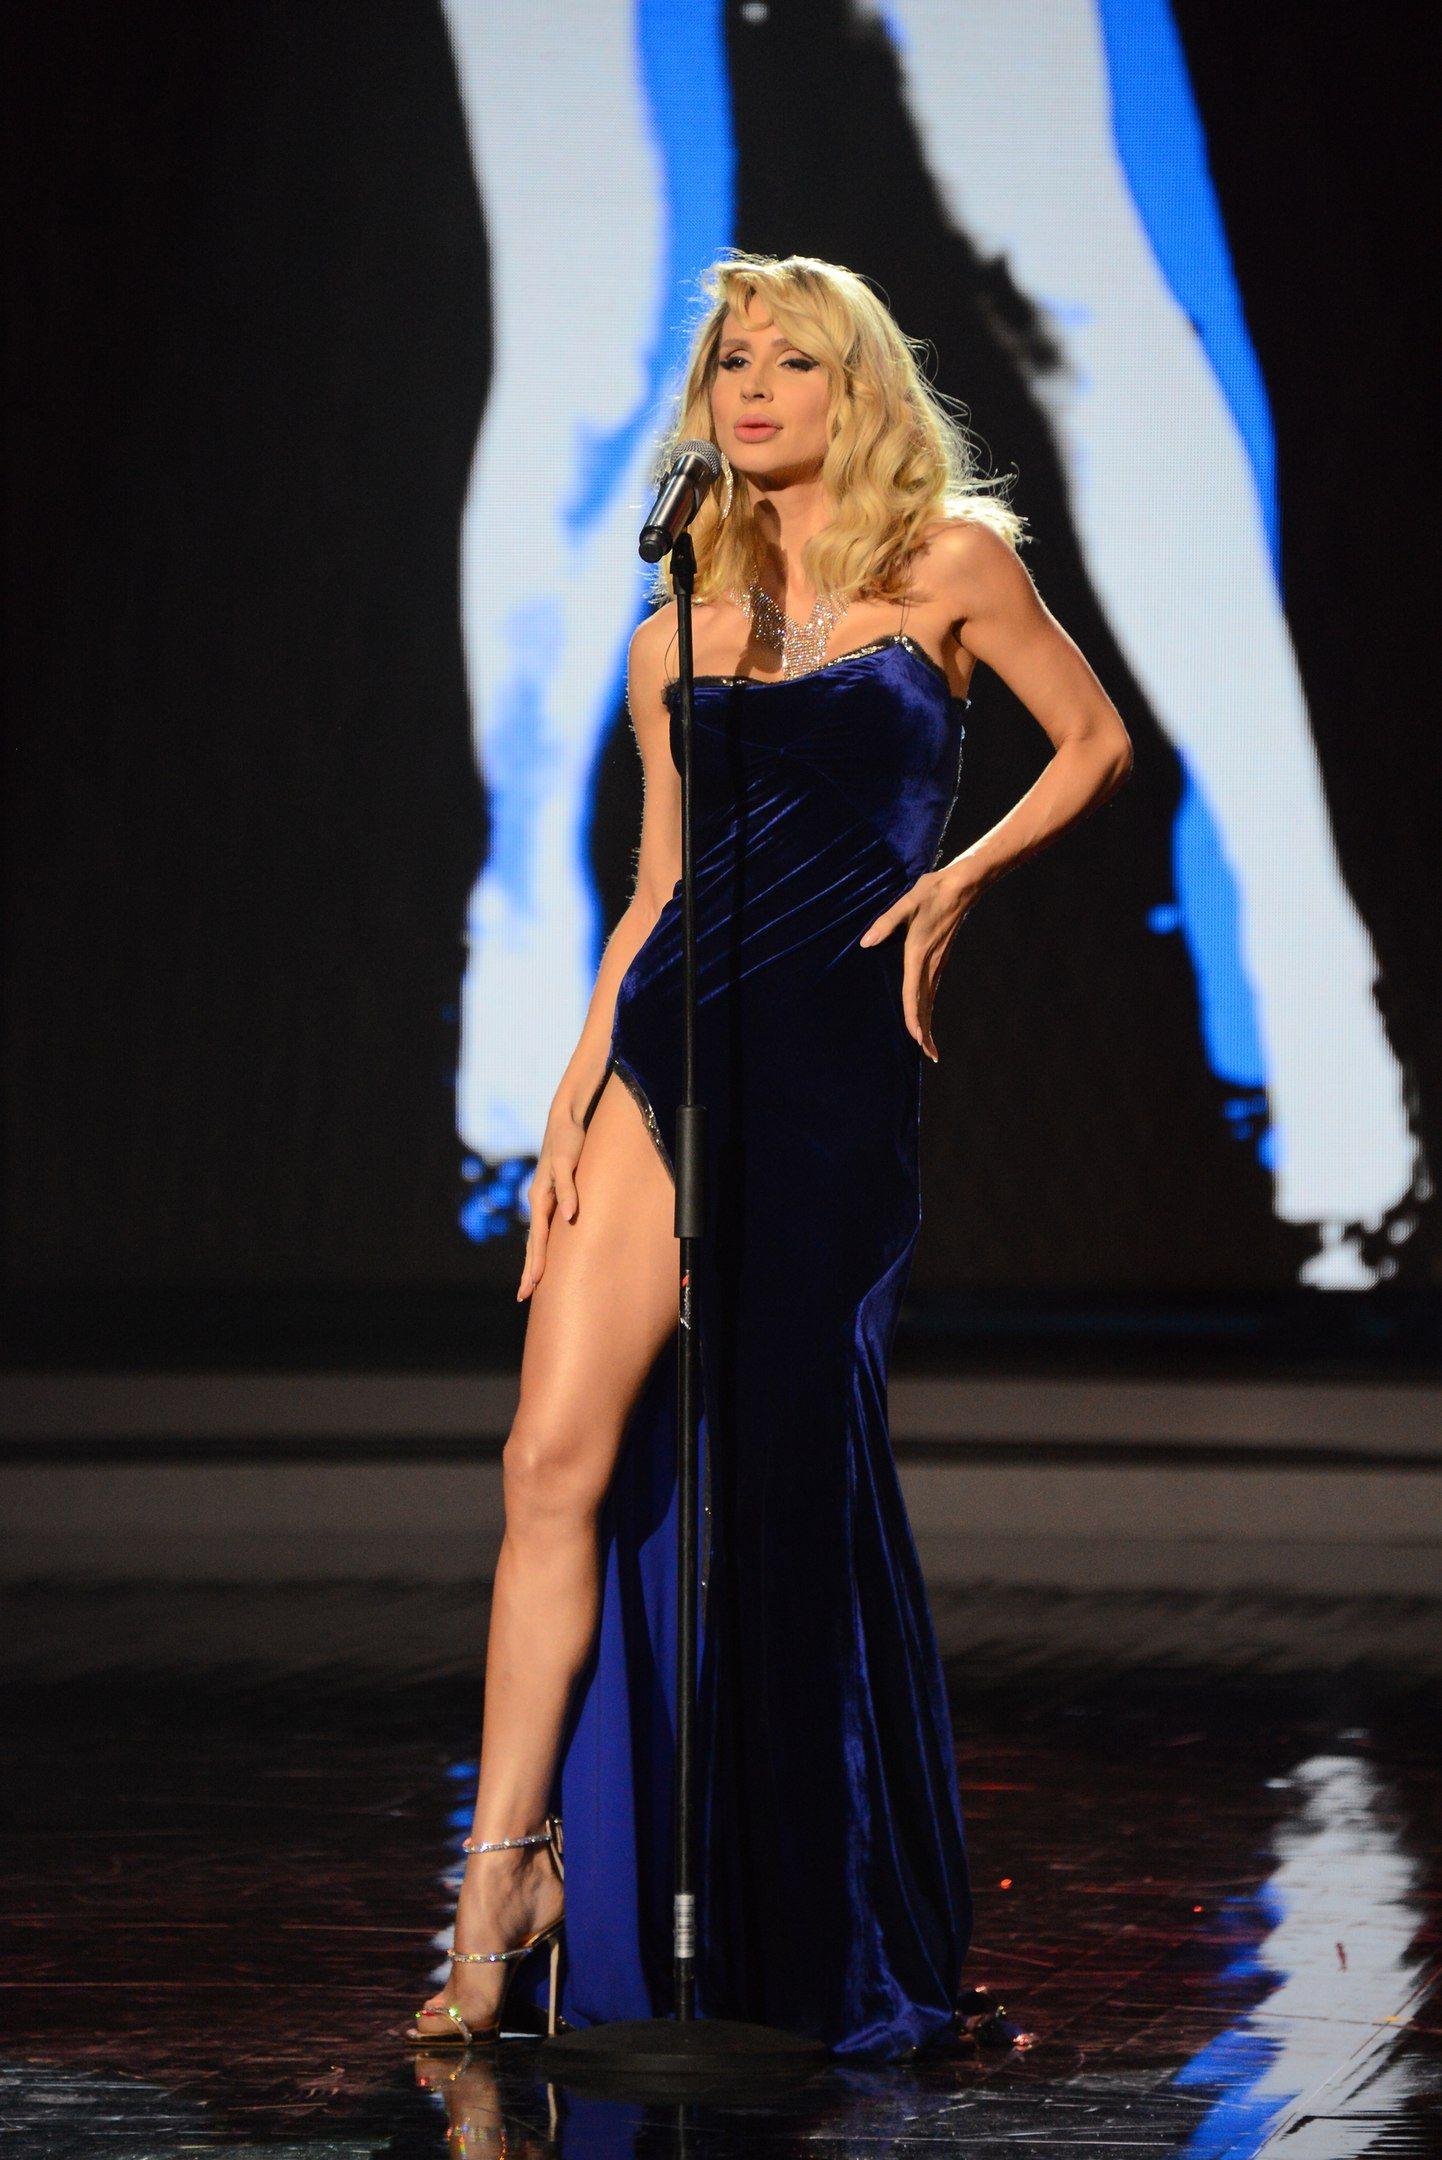 Svetlana Loboda Nude Photos 20